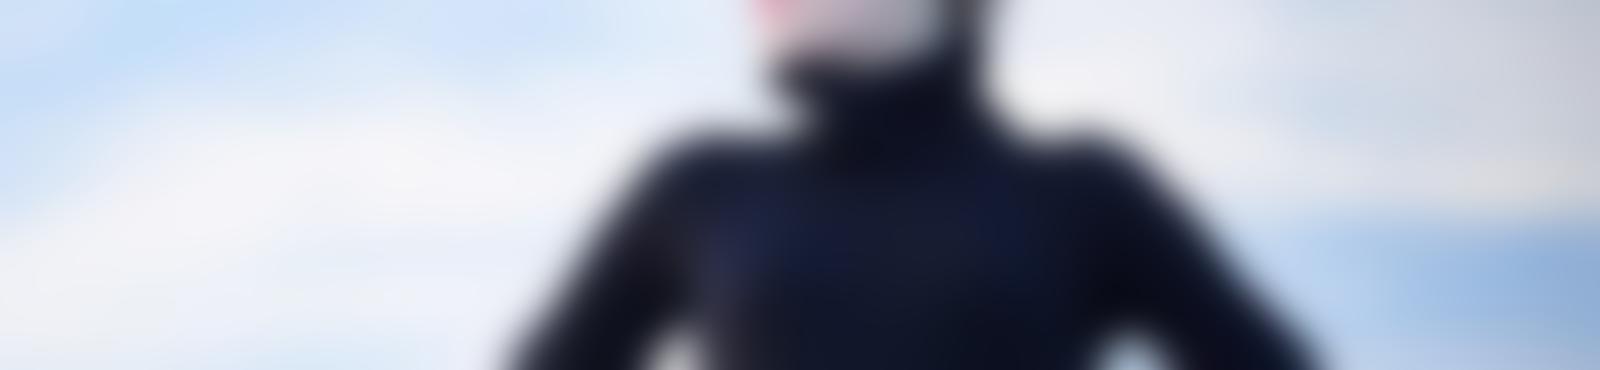 Blurred c460cd5d d9e6 41b7 9fbb 2368bbc8b47c